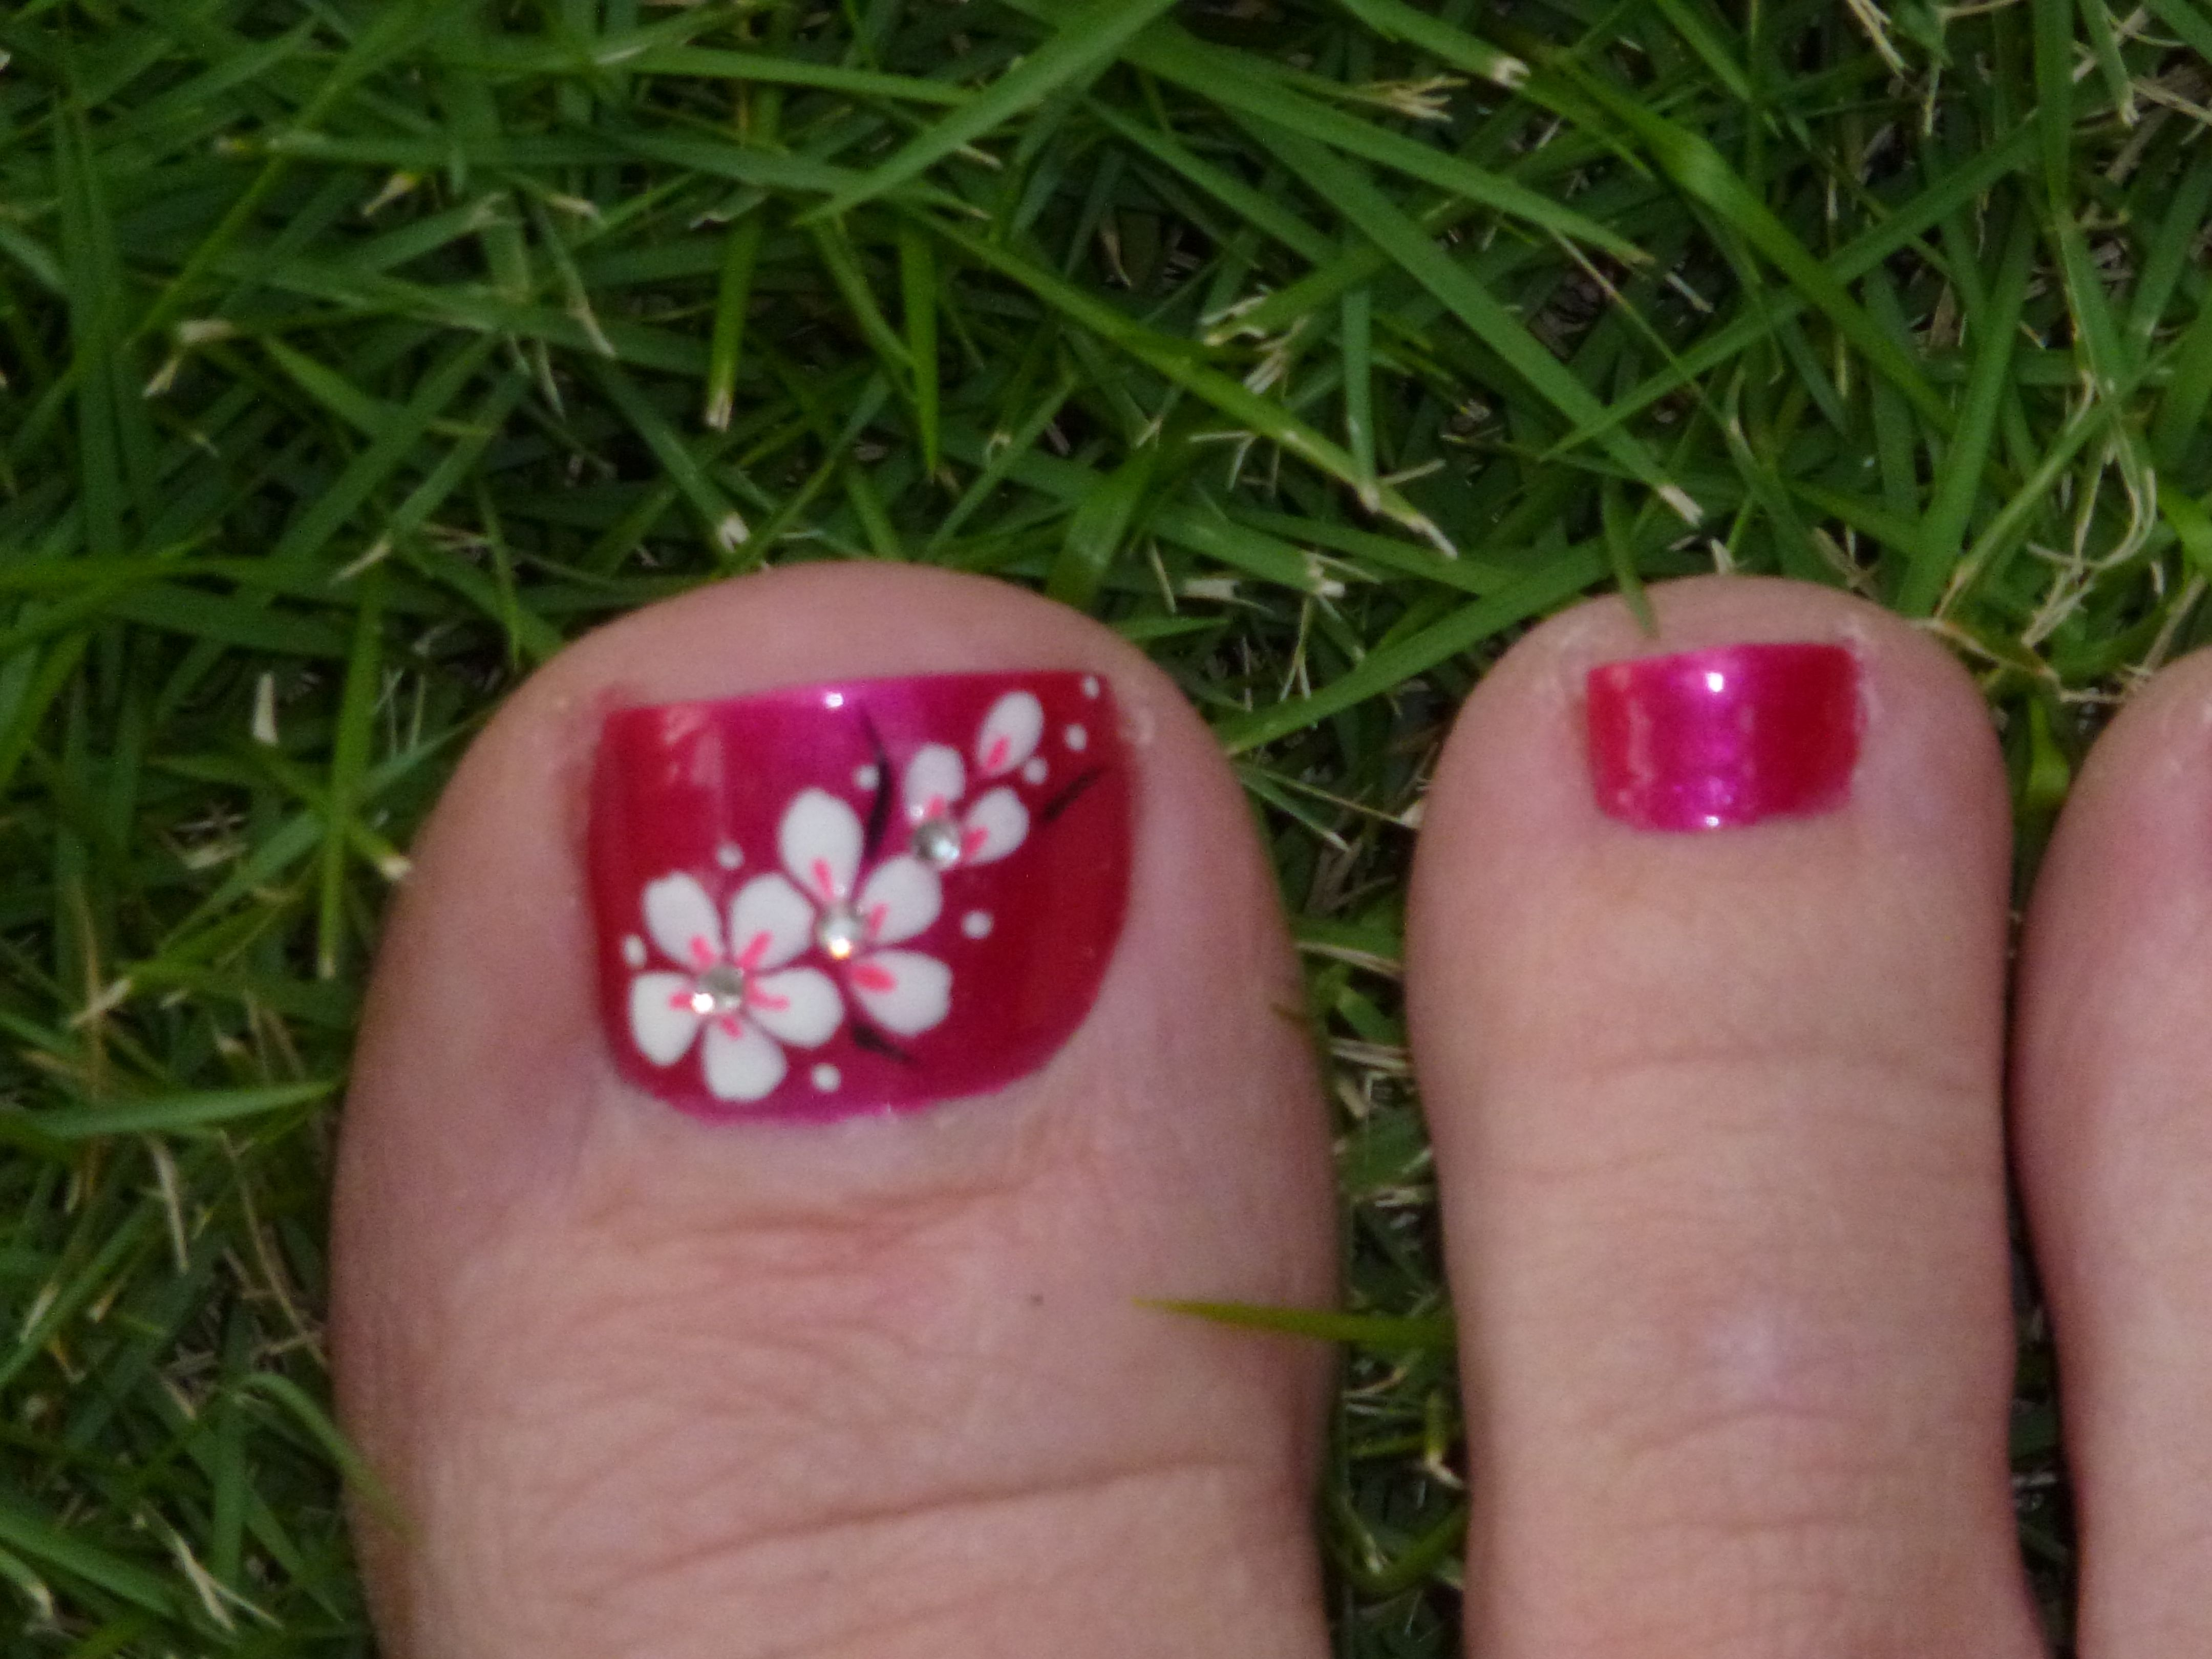 Awesome Eden Nails Glen Rock Nj Gift - Nail Art Ideas - morihati.com